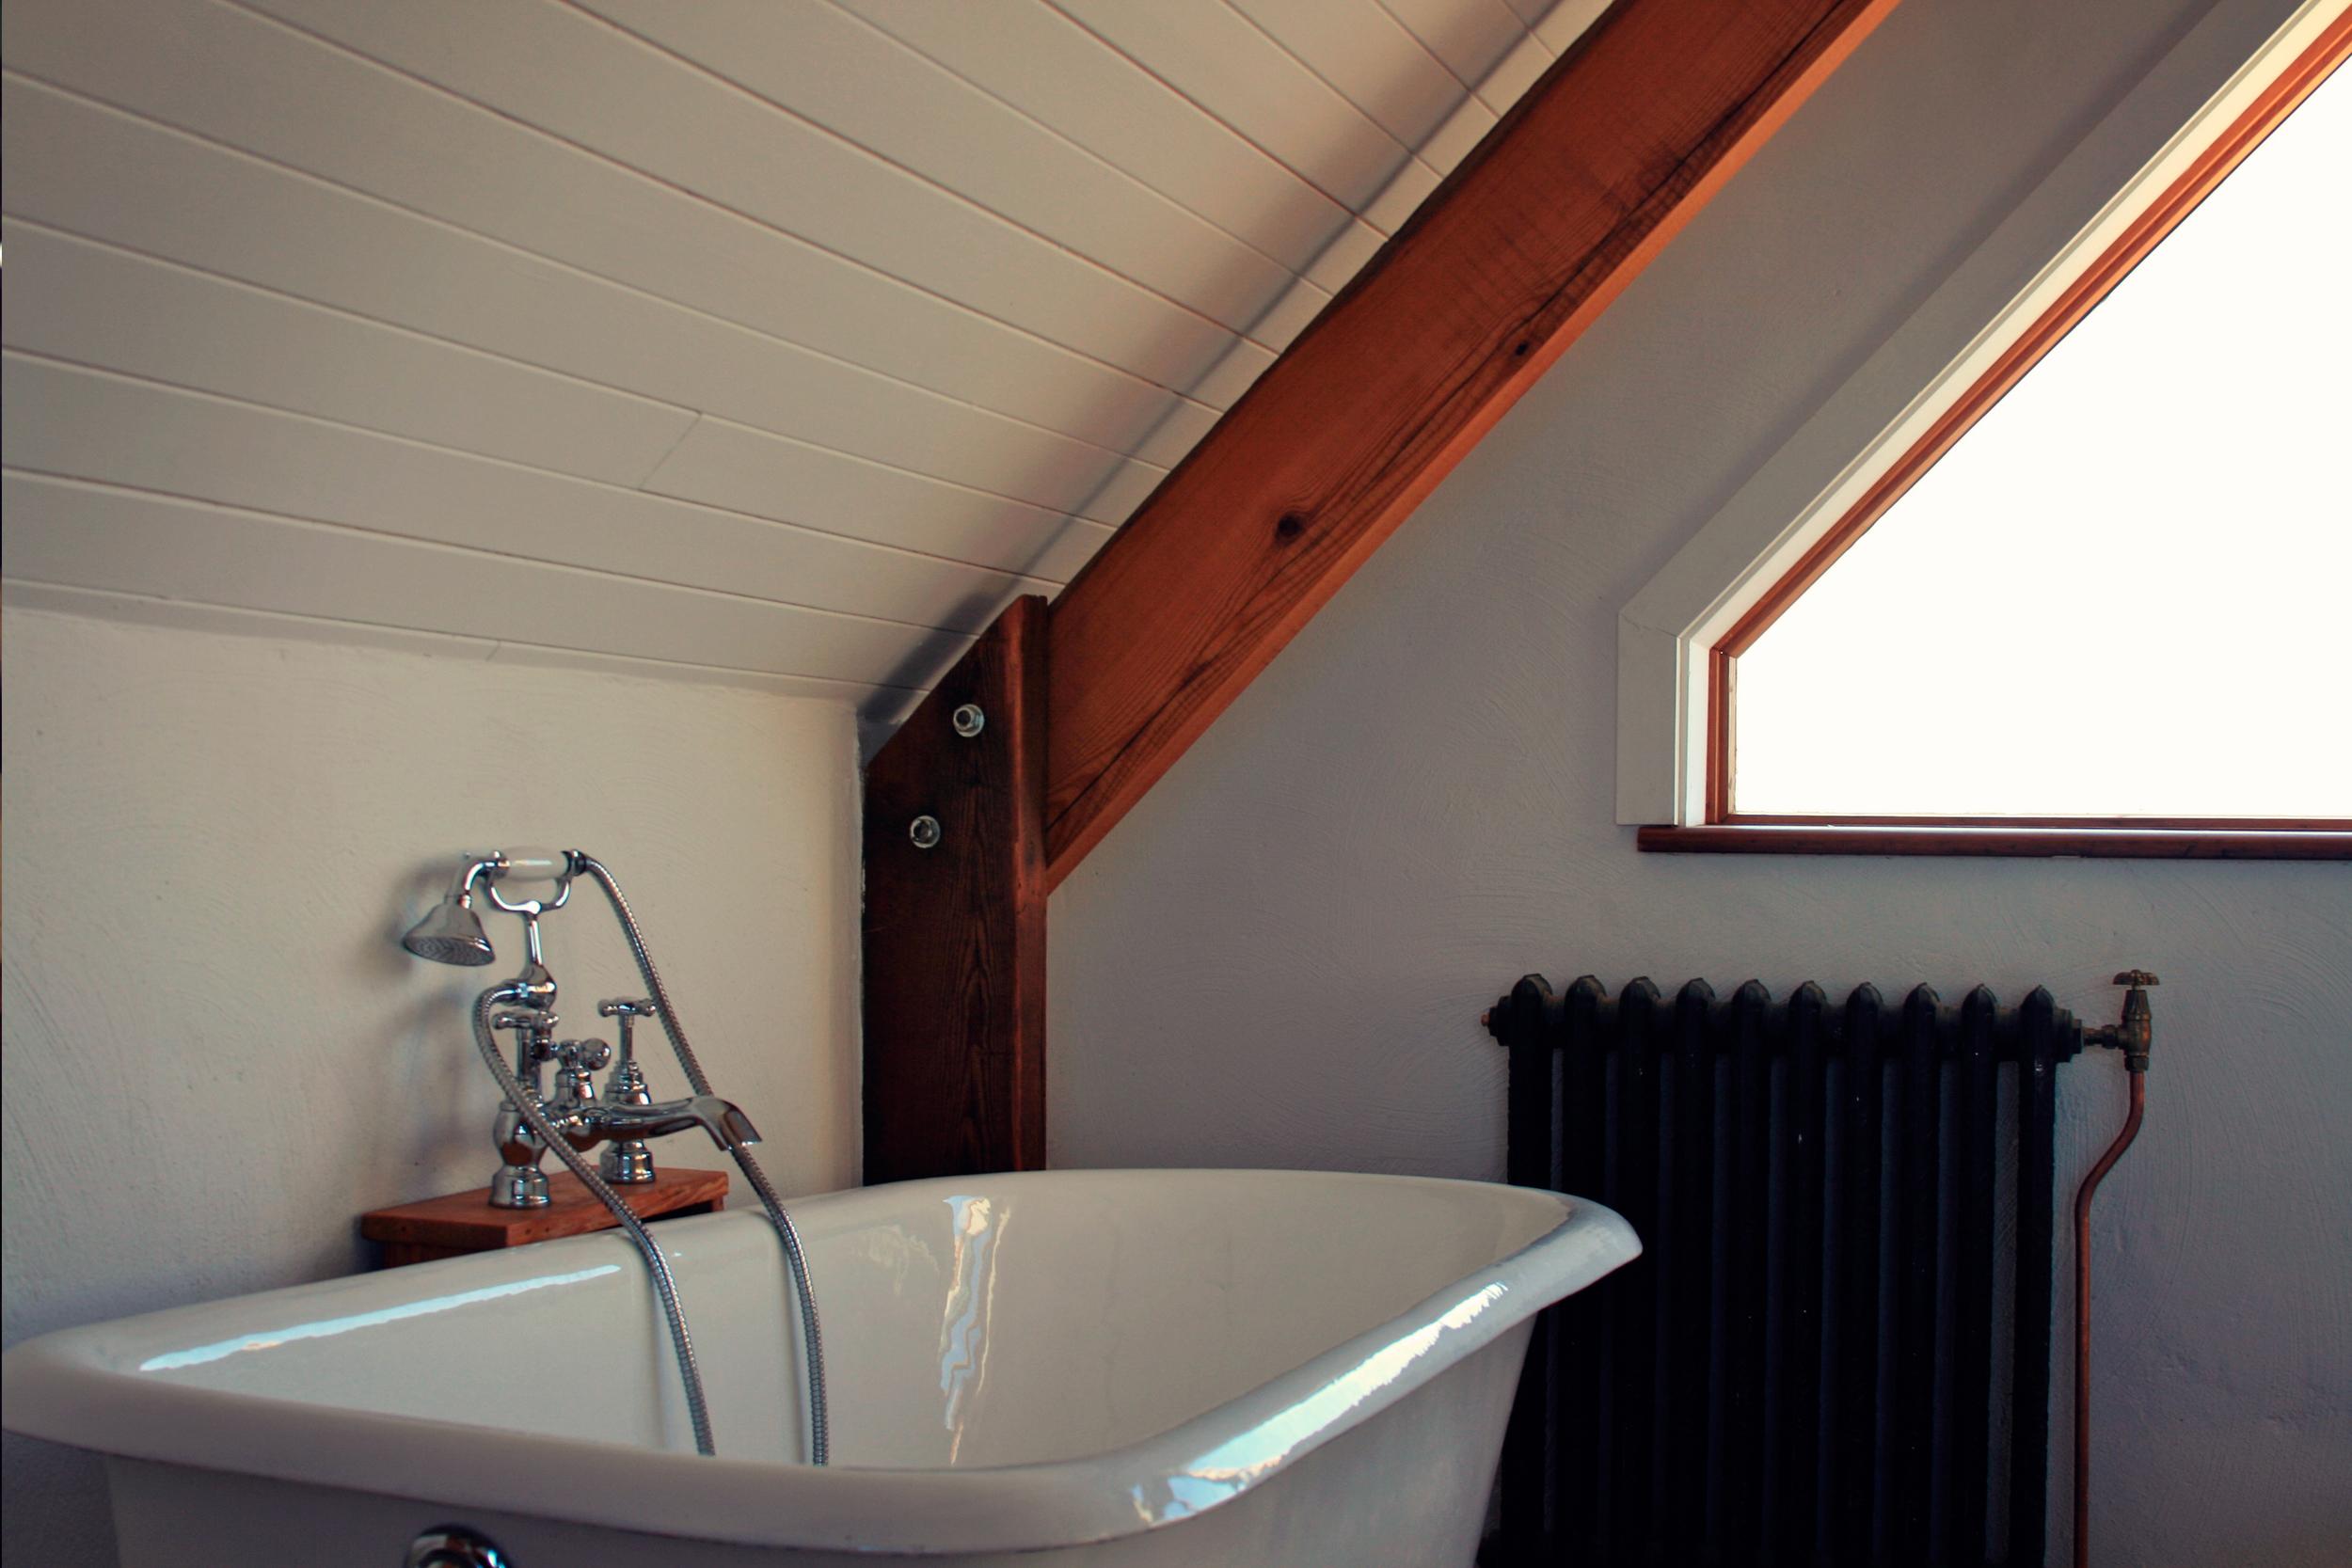 Cast iron bath and radiator on top floor